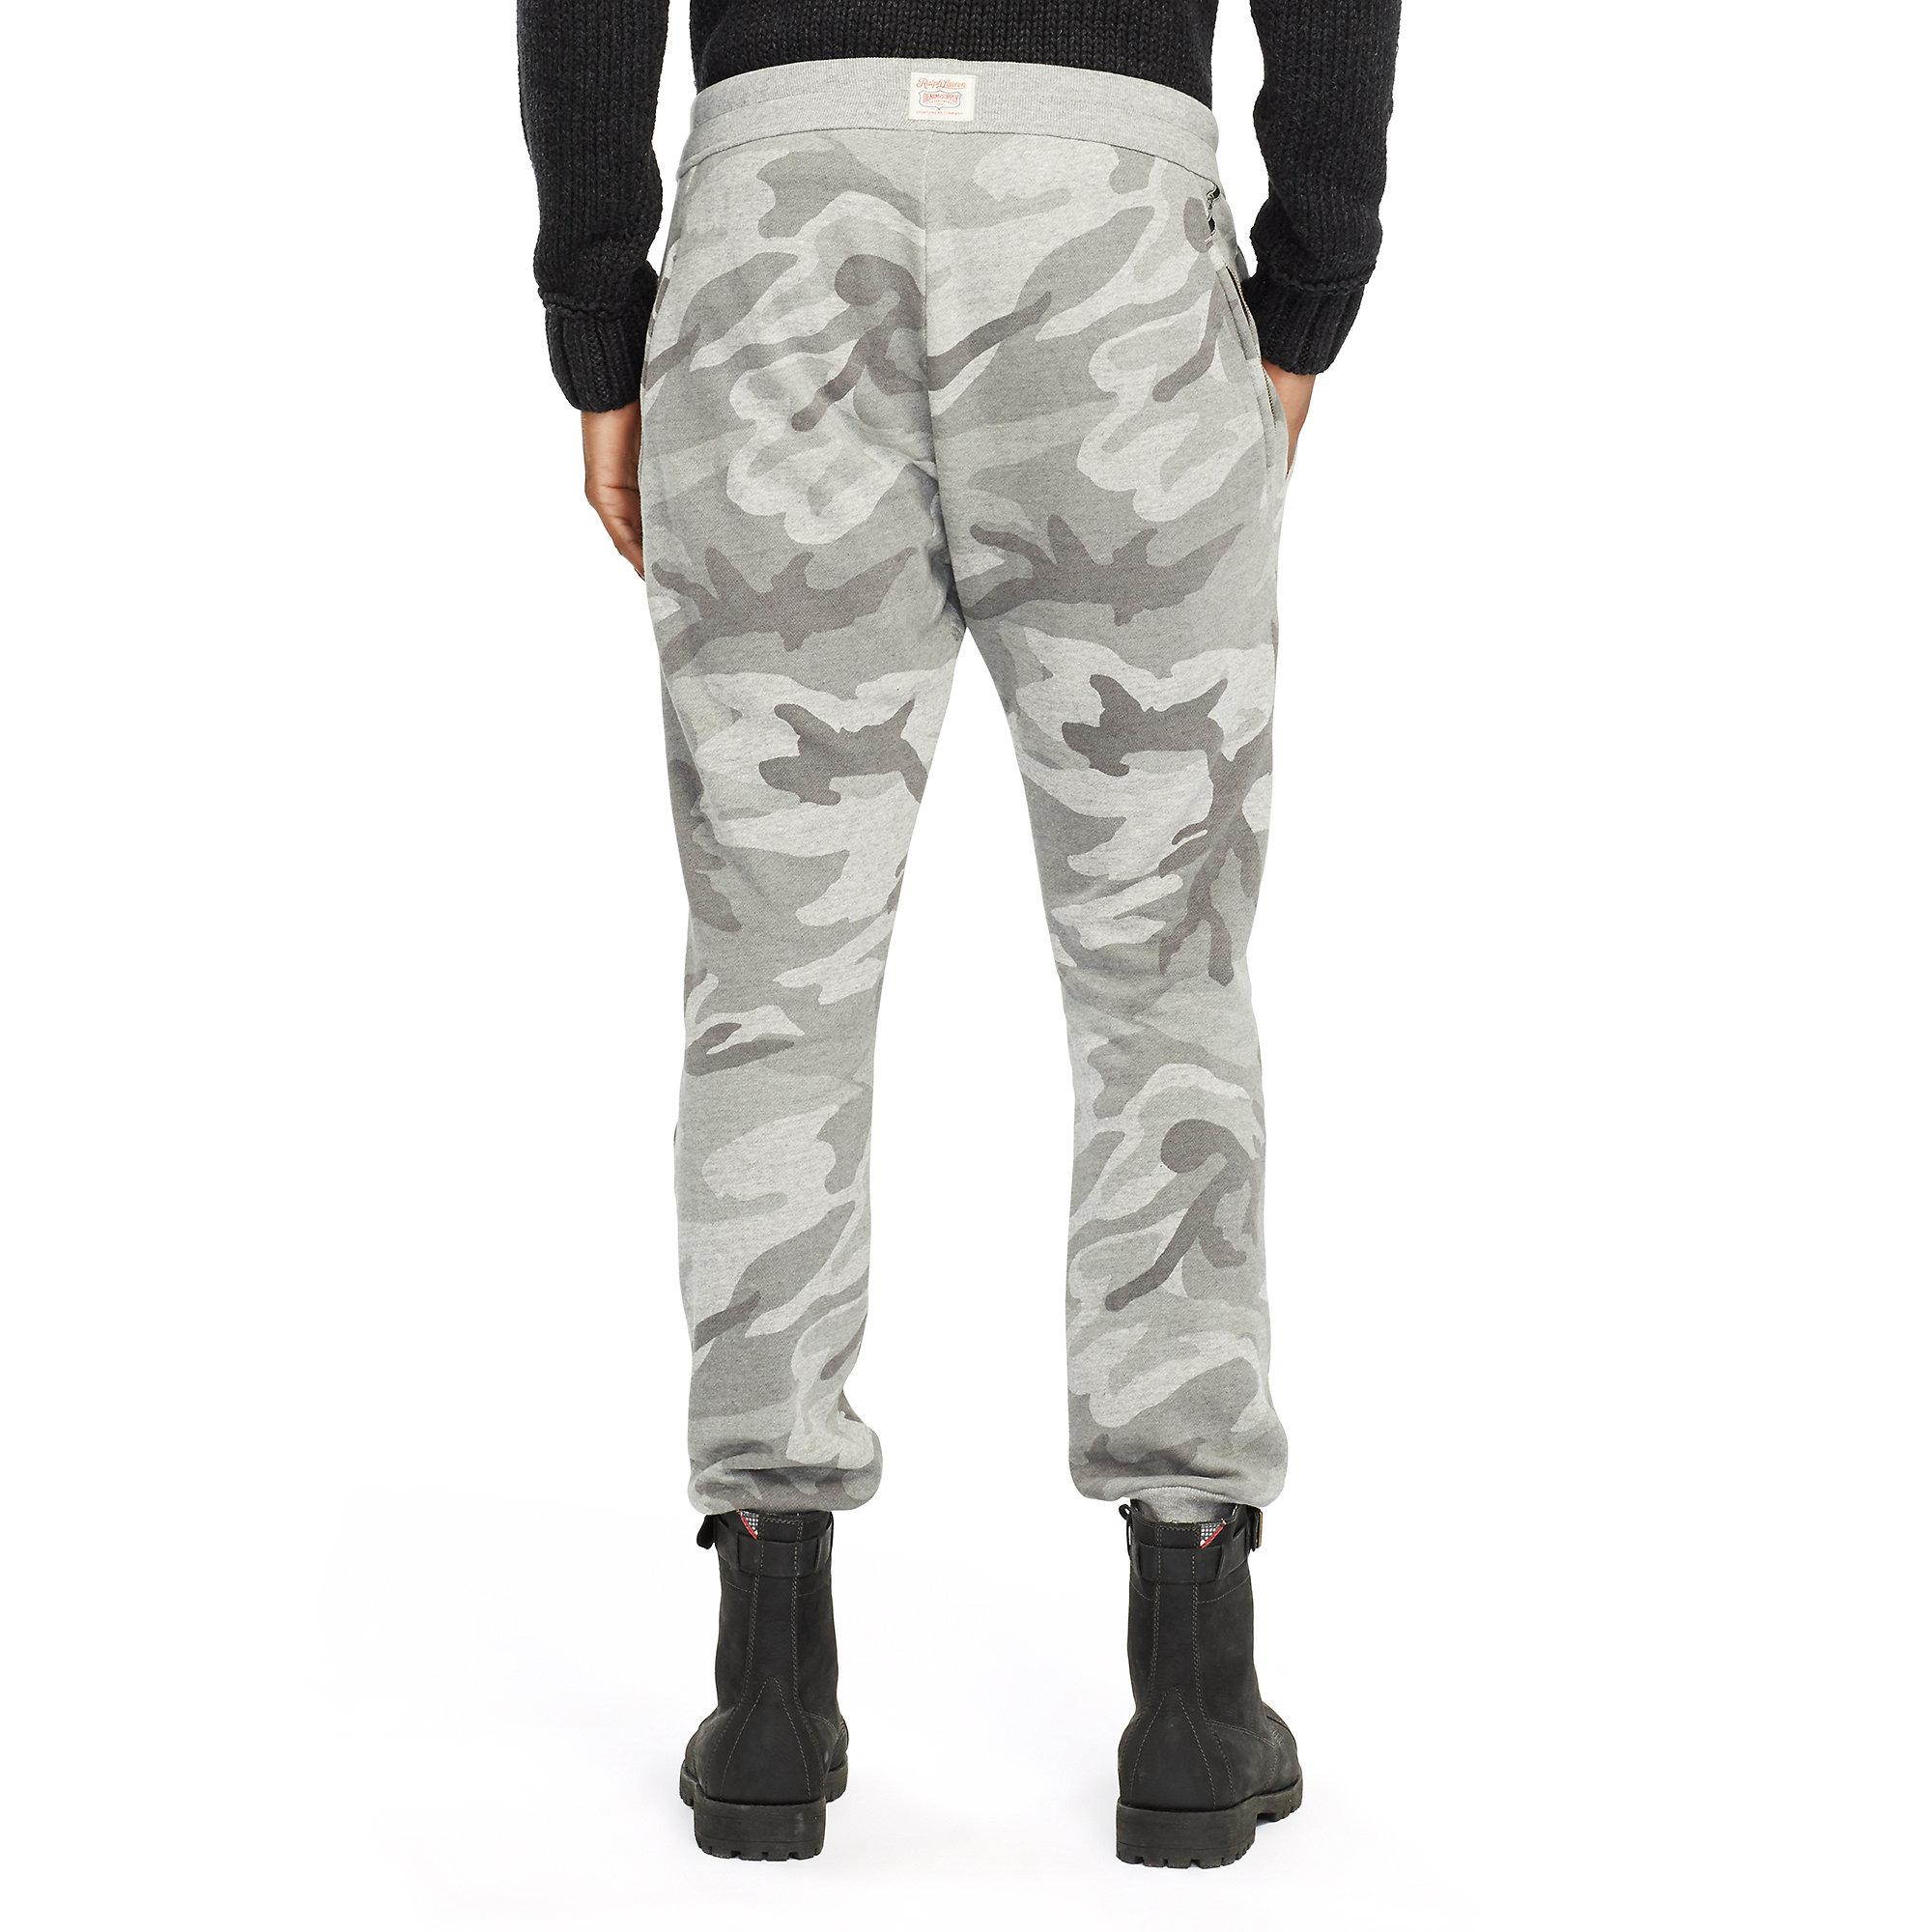 e87782da0d81a Denim & Supply Ralph Lauren Camo Fleece Jogger Pant in Gray for Men ...